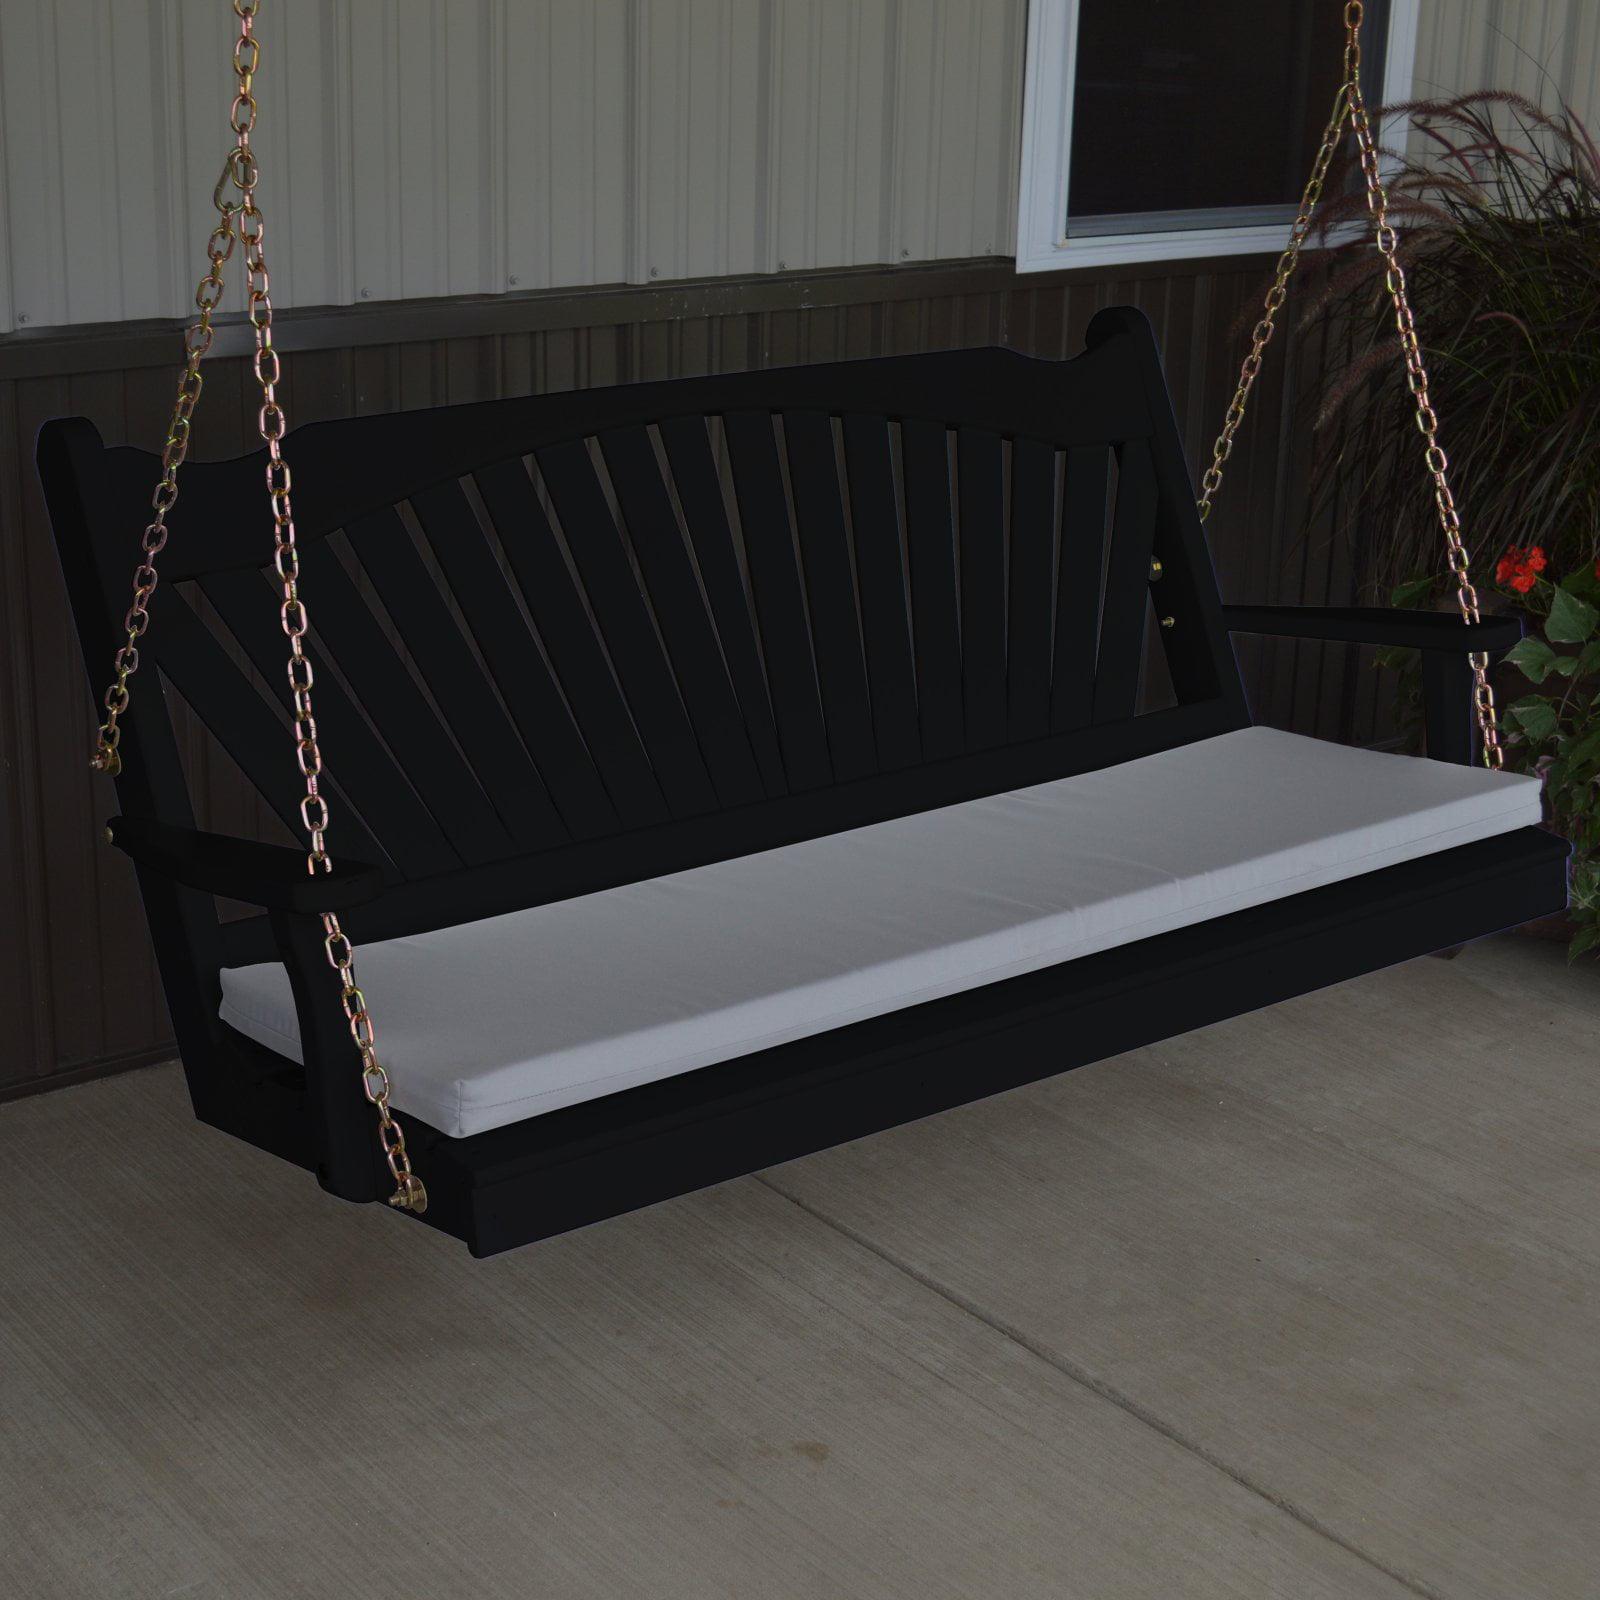 A & L Furniture Yellow Pine Fanback Porch Swing